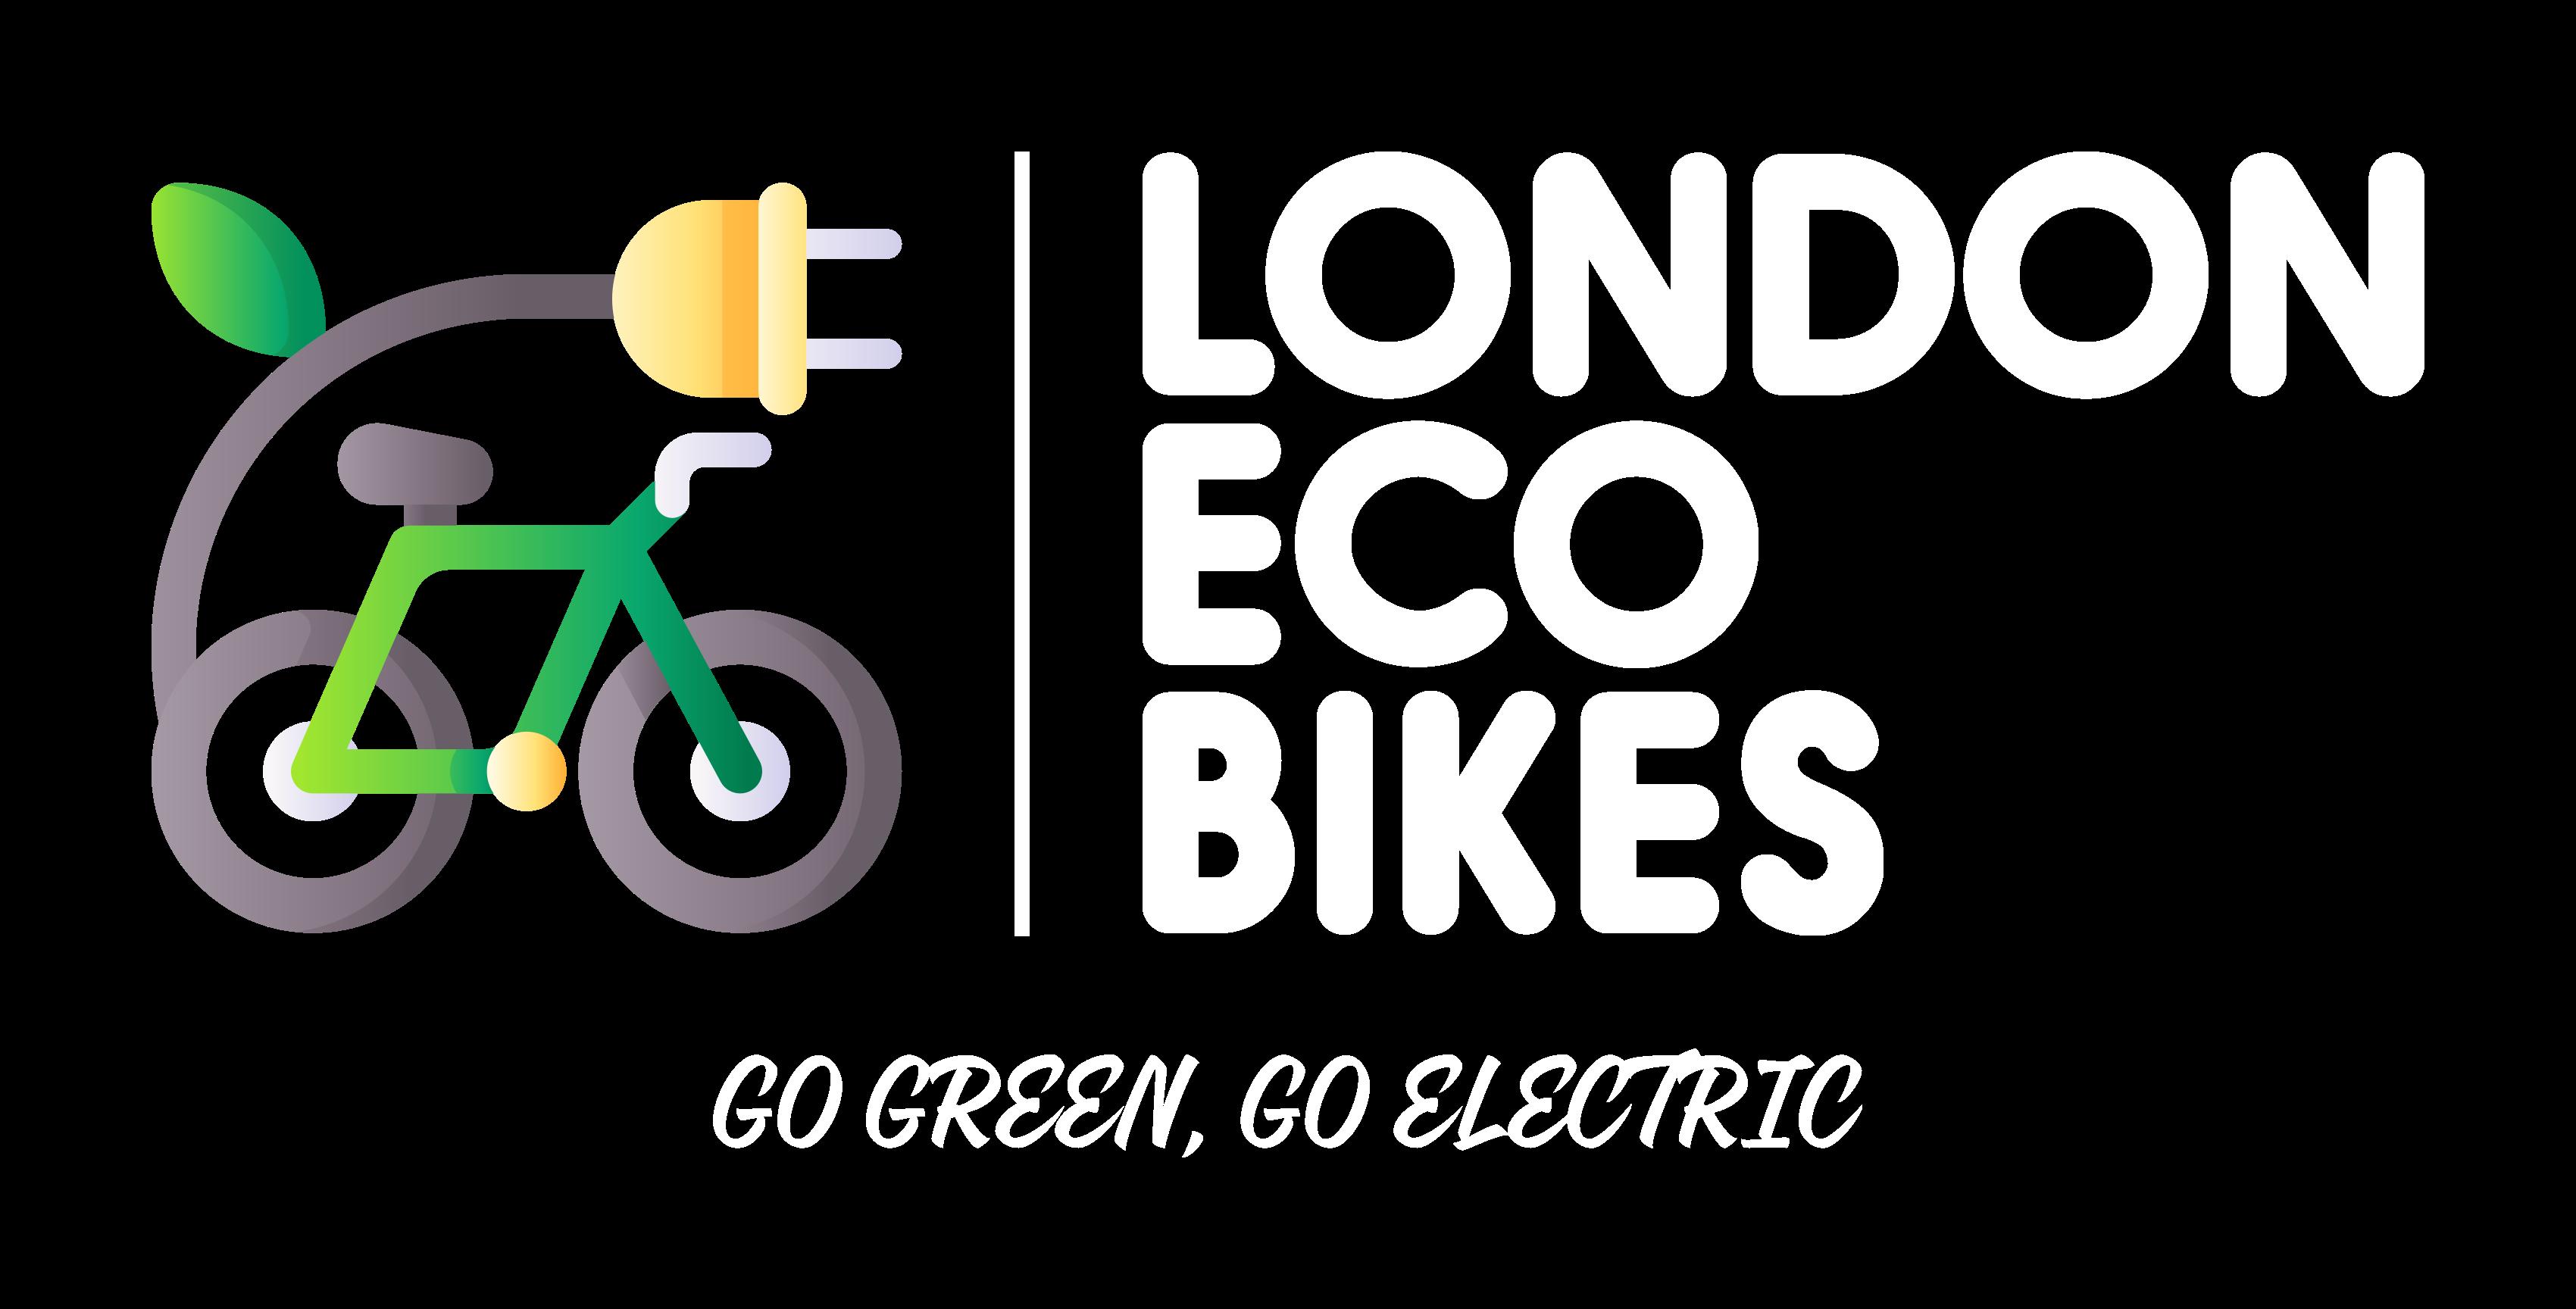 London Eco Bikes